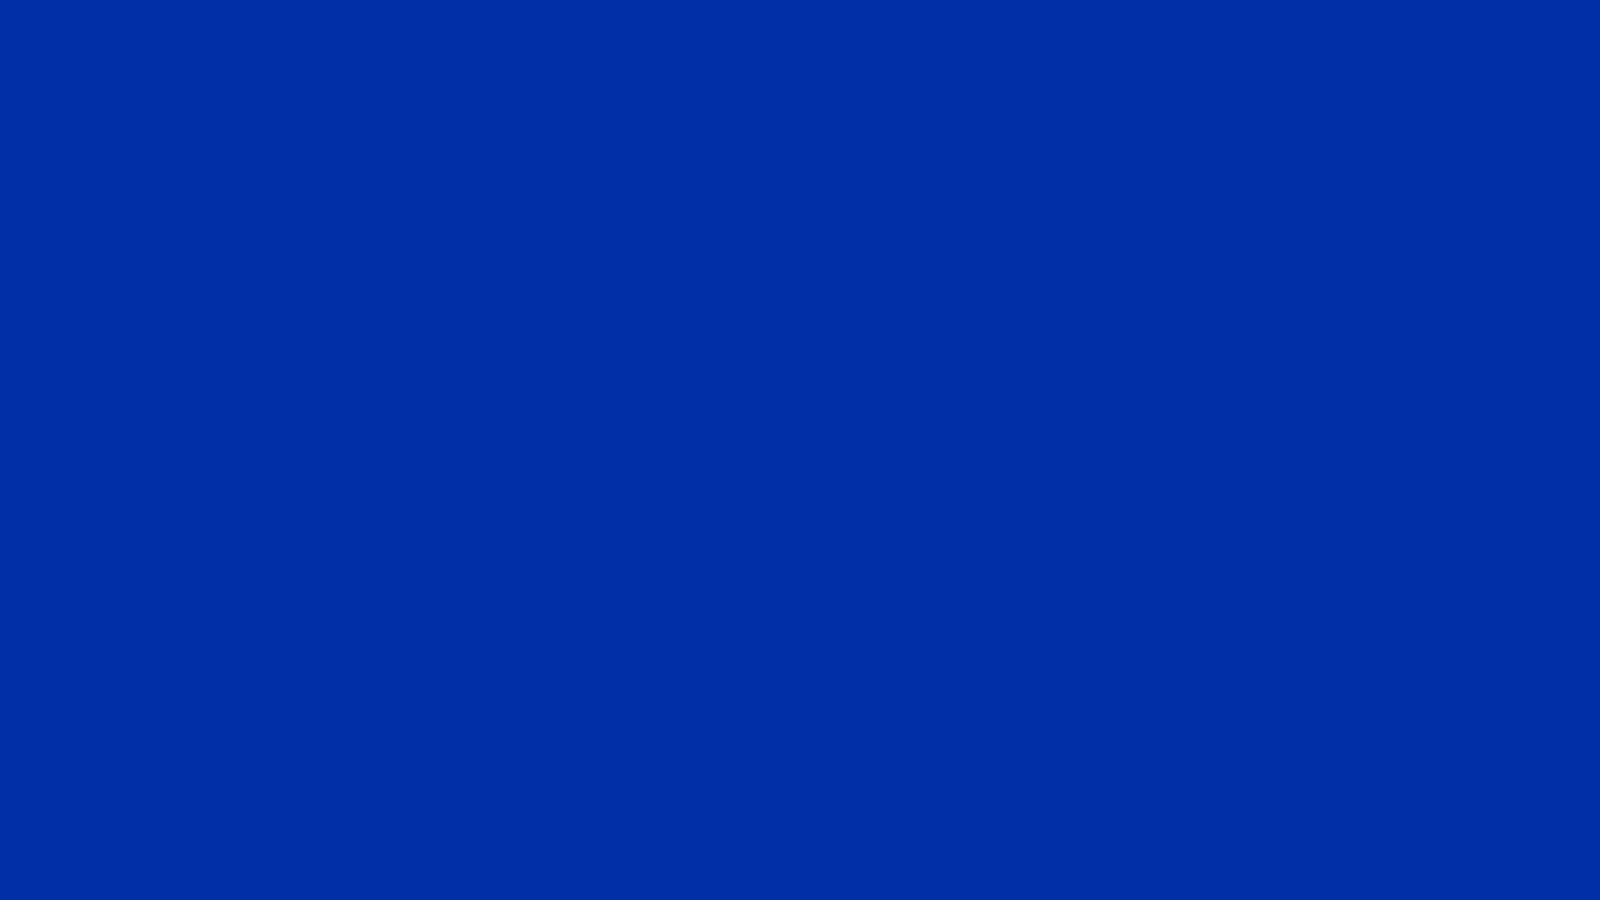 1600x900 International Klein Blue Solid Color Background